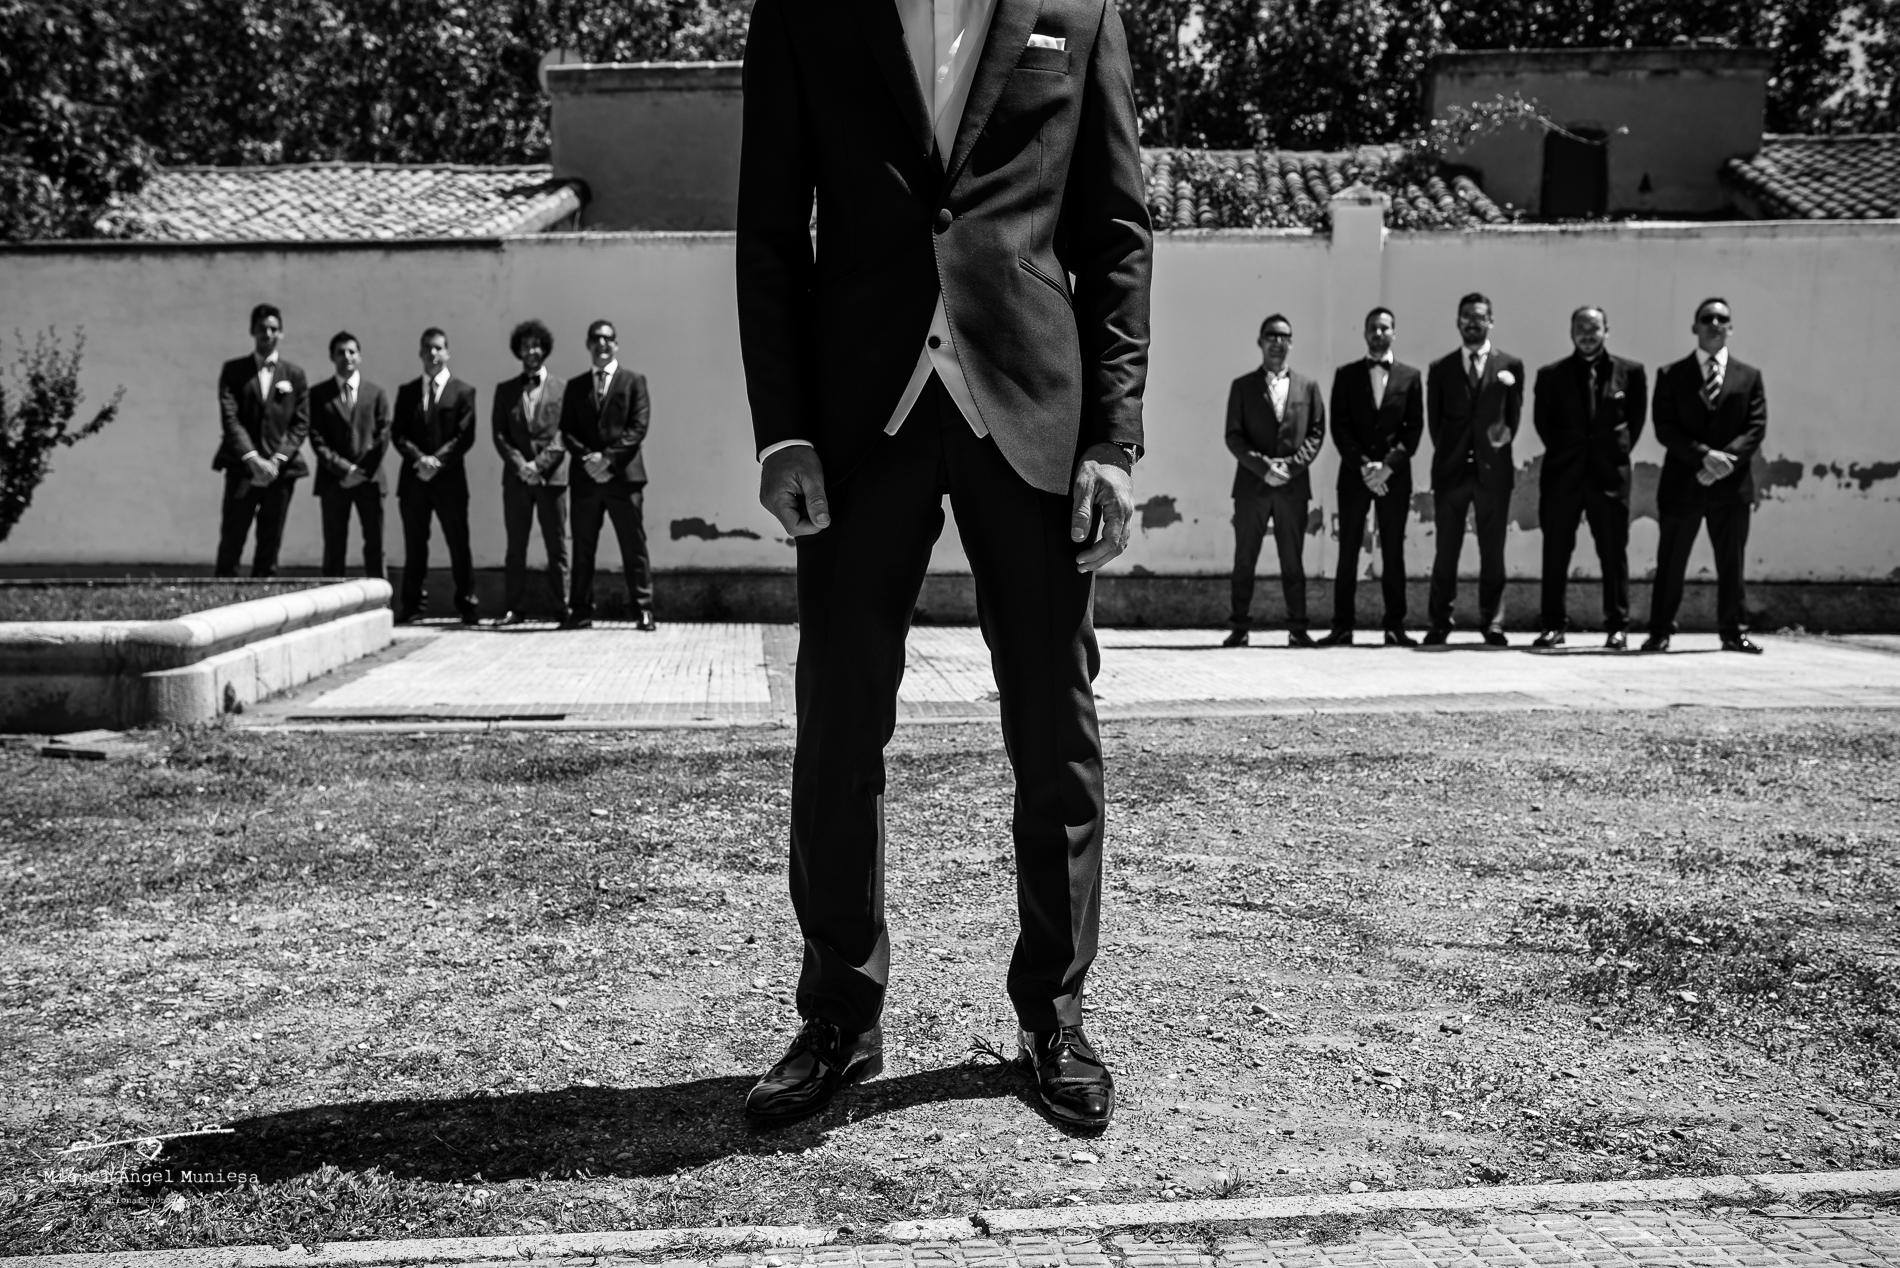 boda, fotografia de boda, boda zaragoza, fotografia, wedding, wedding photography, miguel angel muniesa, fotografo boda Zaragoza, fotografo boda, destination wedding_ 020